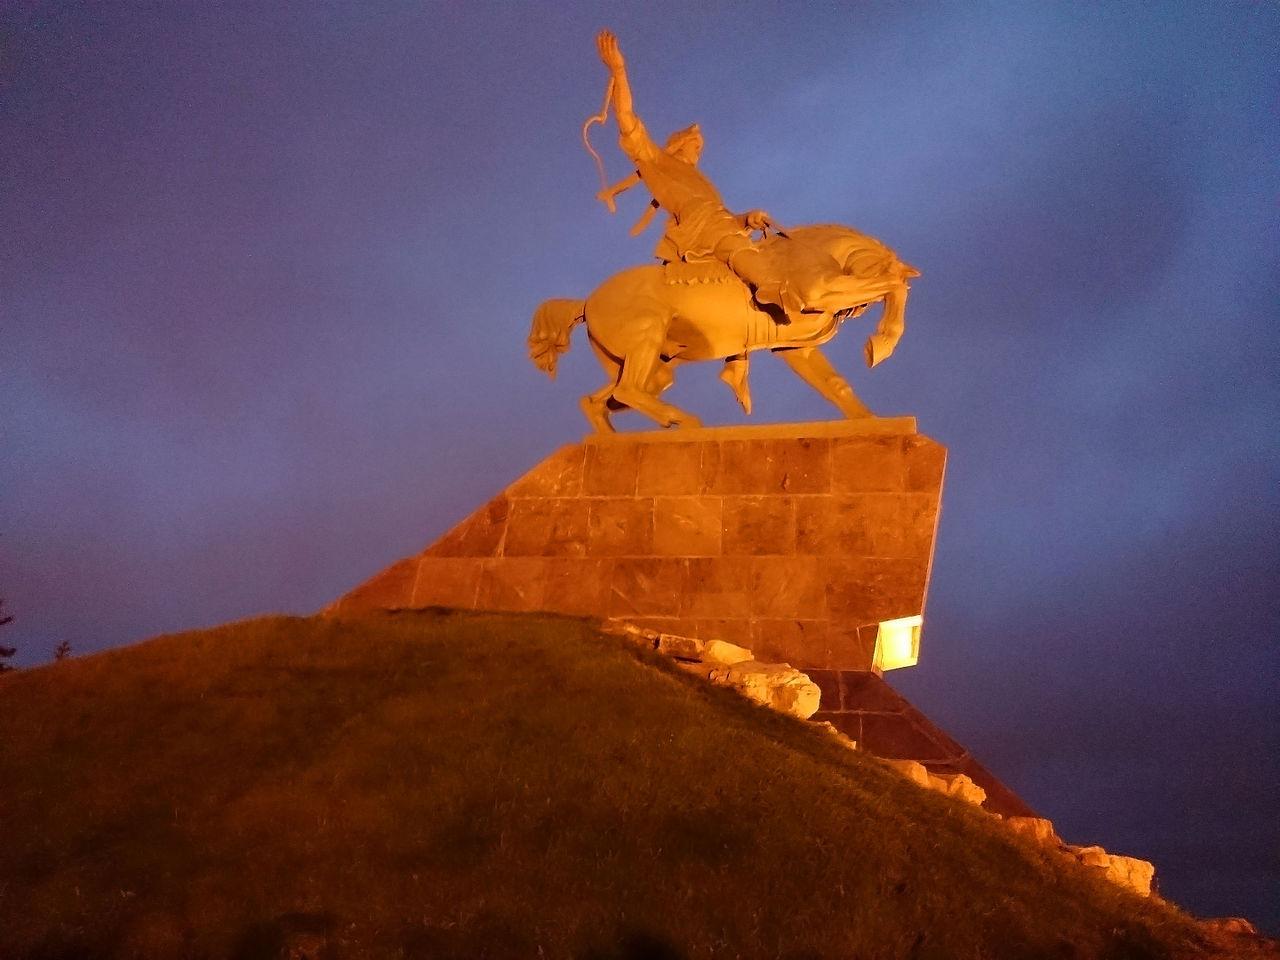 Памятник Салавату Юлаеву, Уфа, Башкортостан